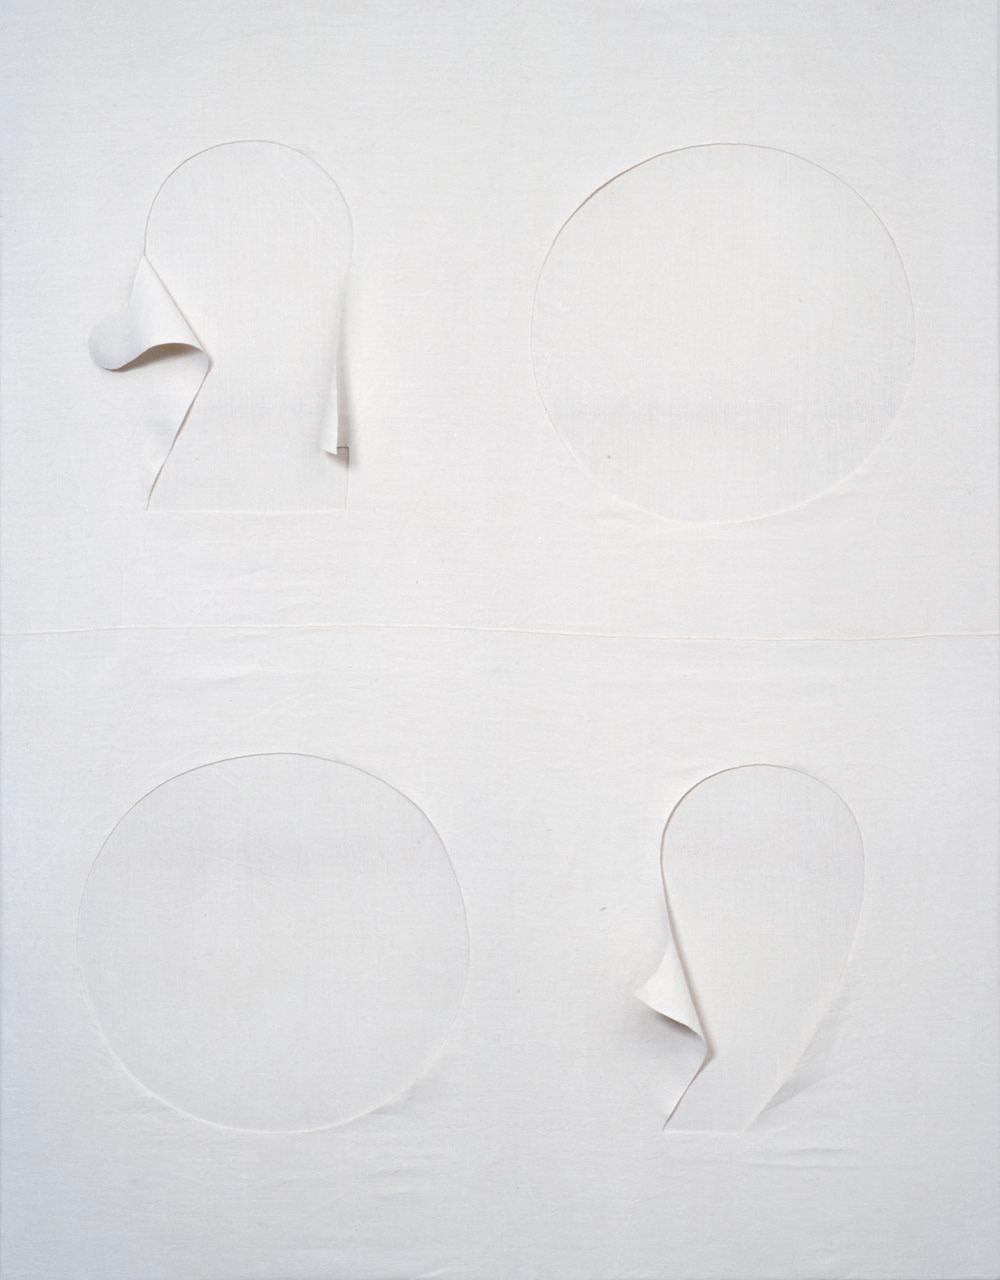 "<div class=""artwork_caption""><p>Untitled, 2009</p></div>"